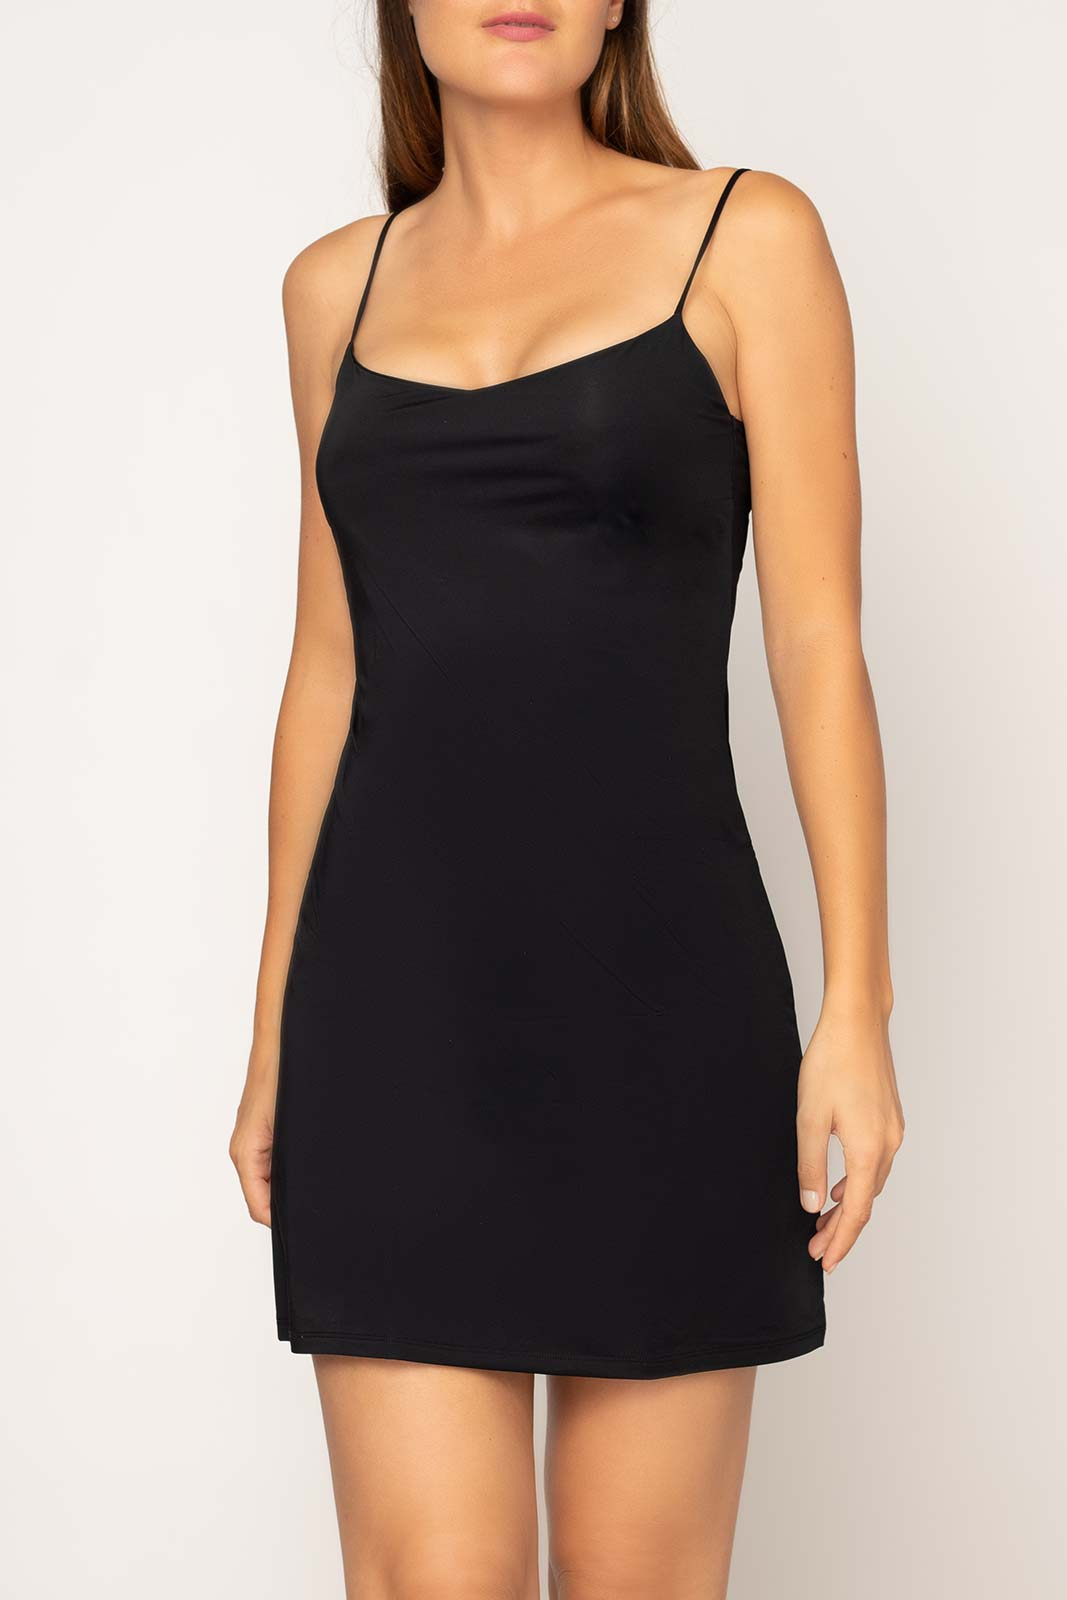 Fond de robe Maille Noir - Dessus Dessous_Affiliate - Modalova